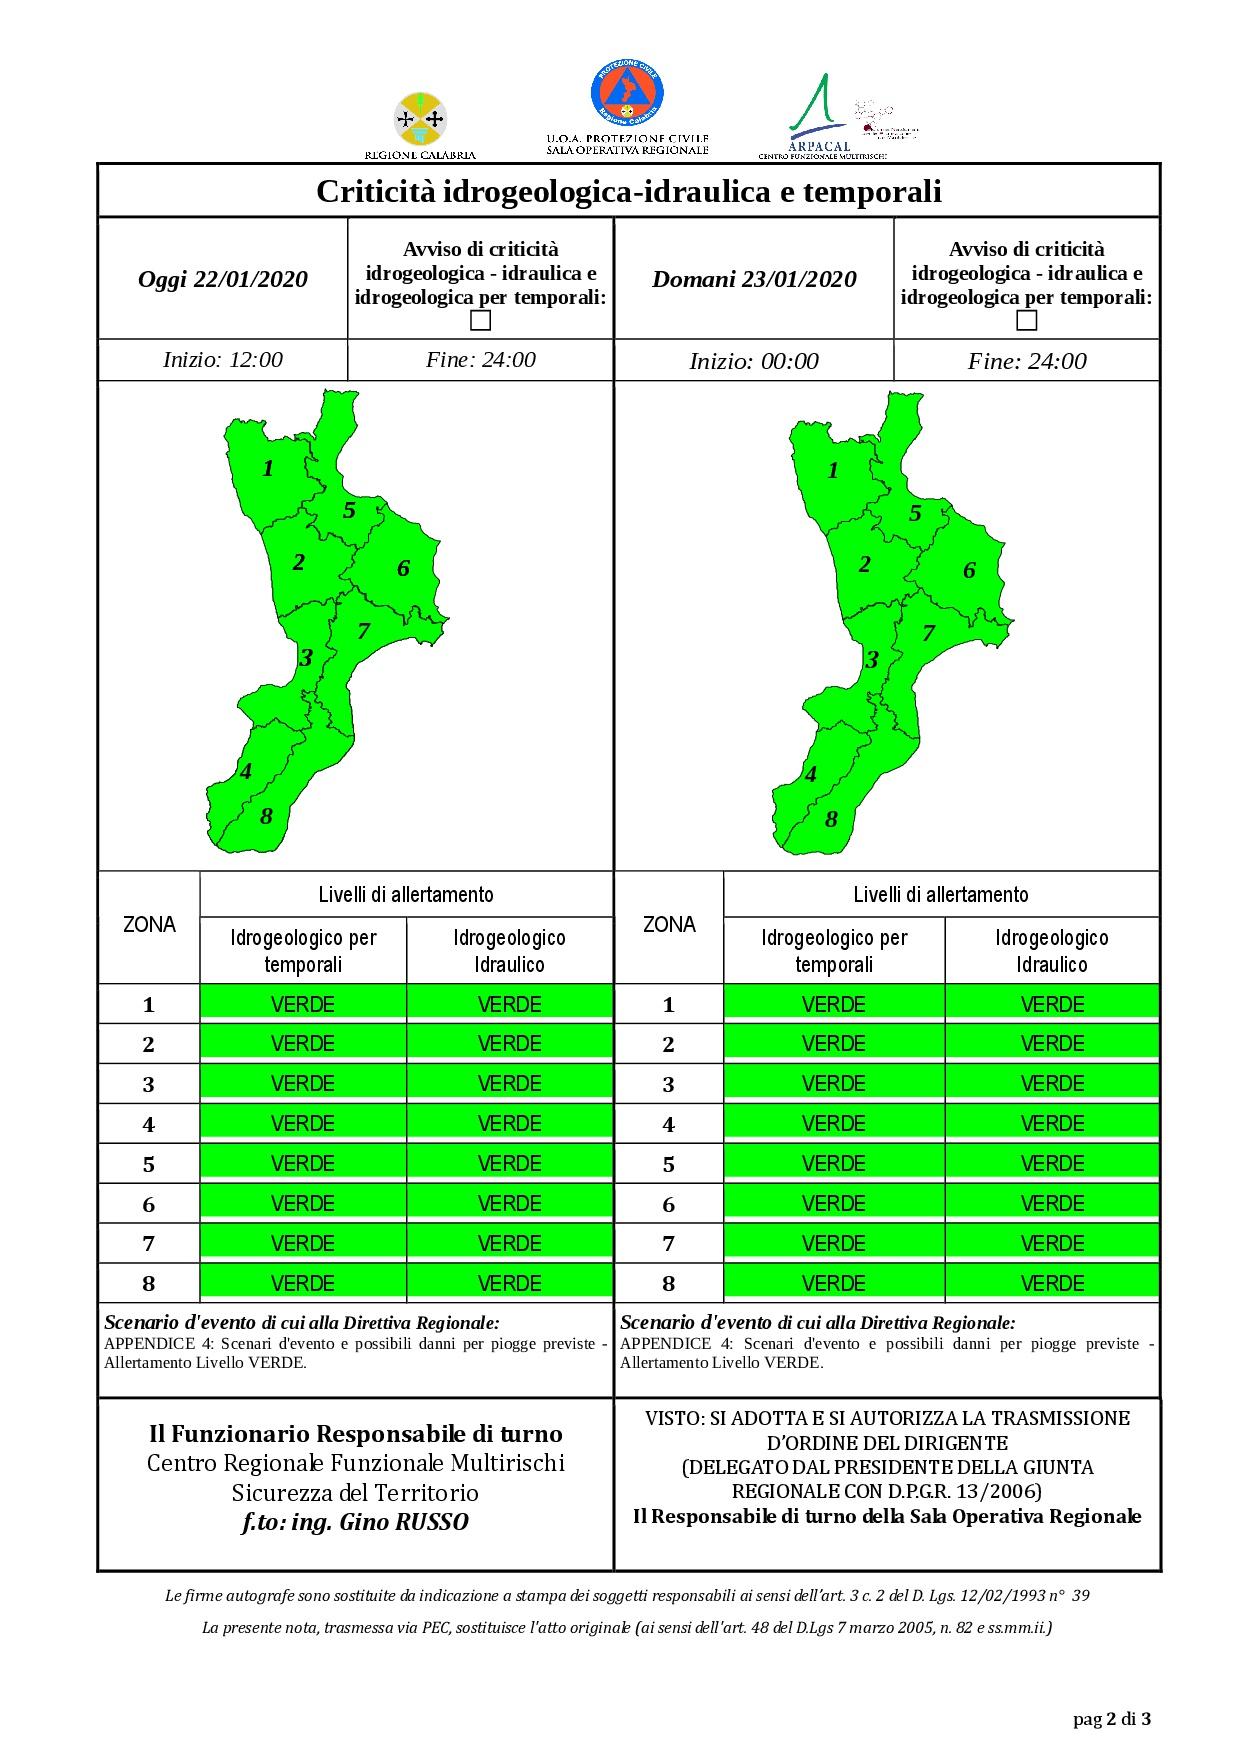 Criticità idrogeologica-idraulica e temporali in Calabria 22-01-2020